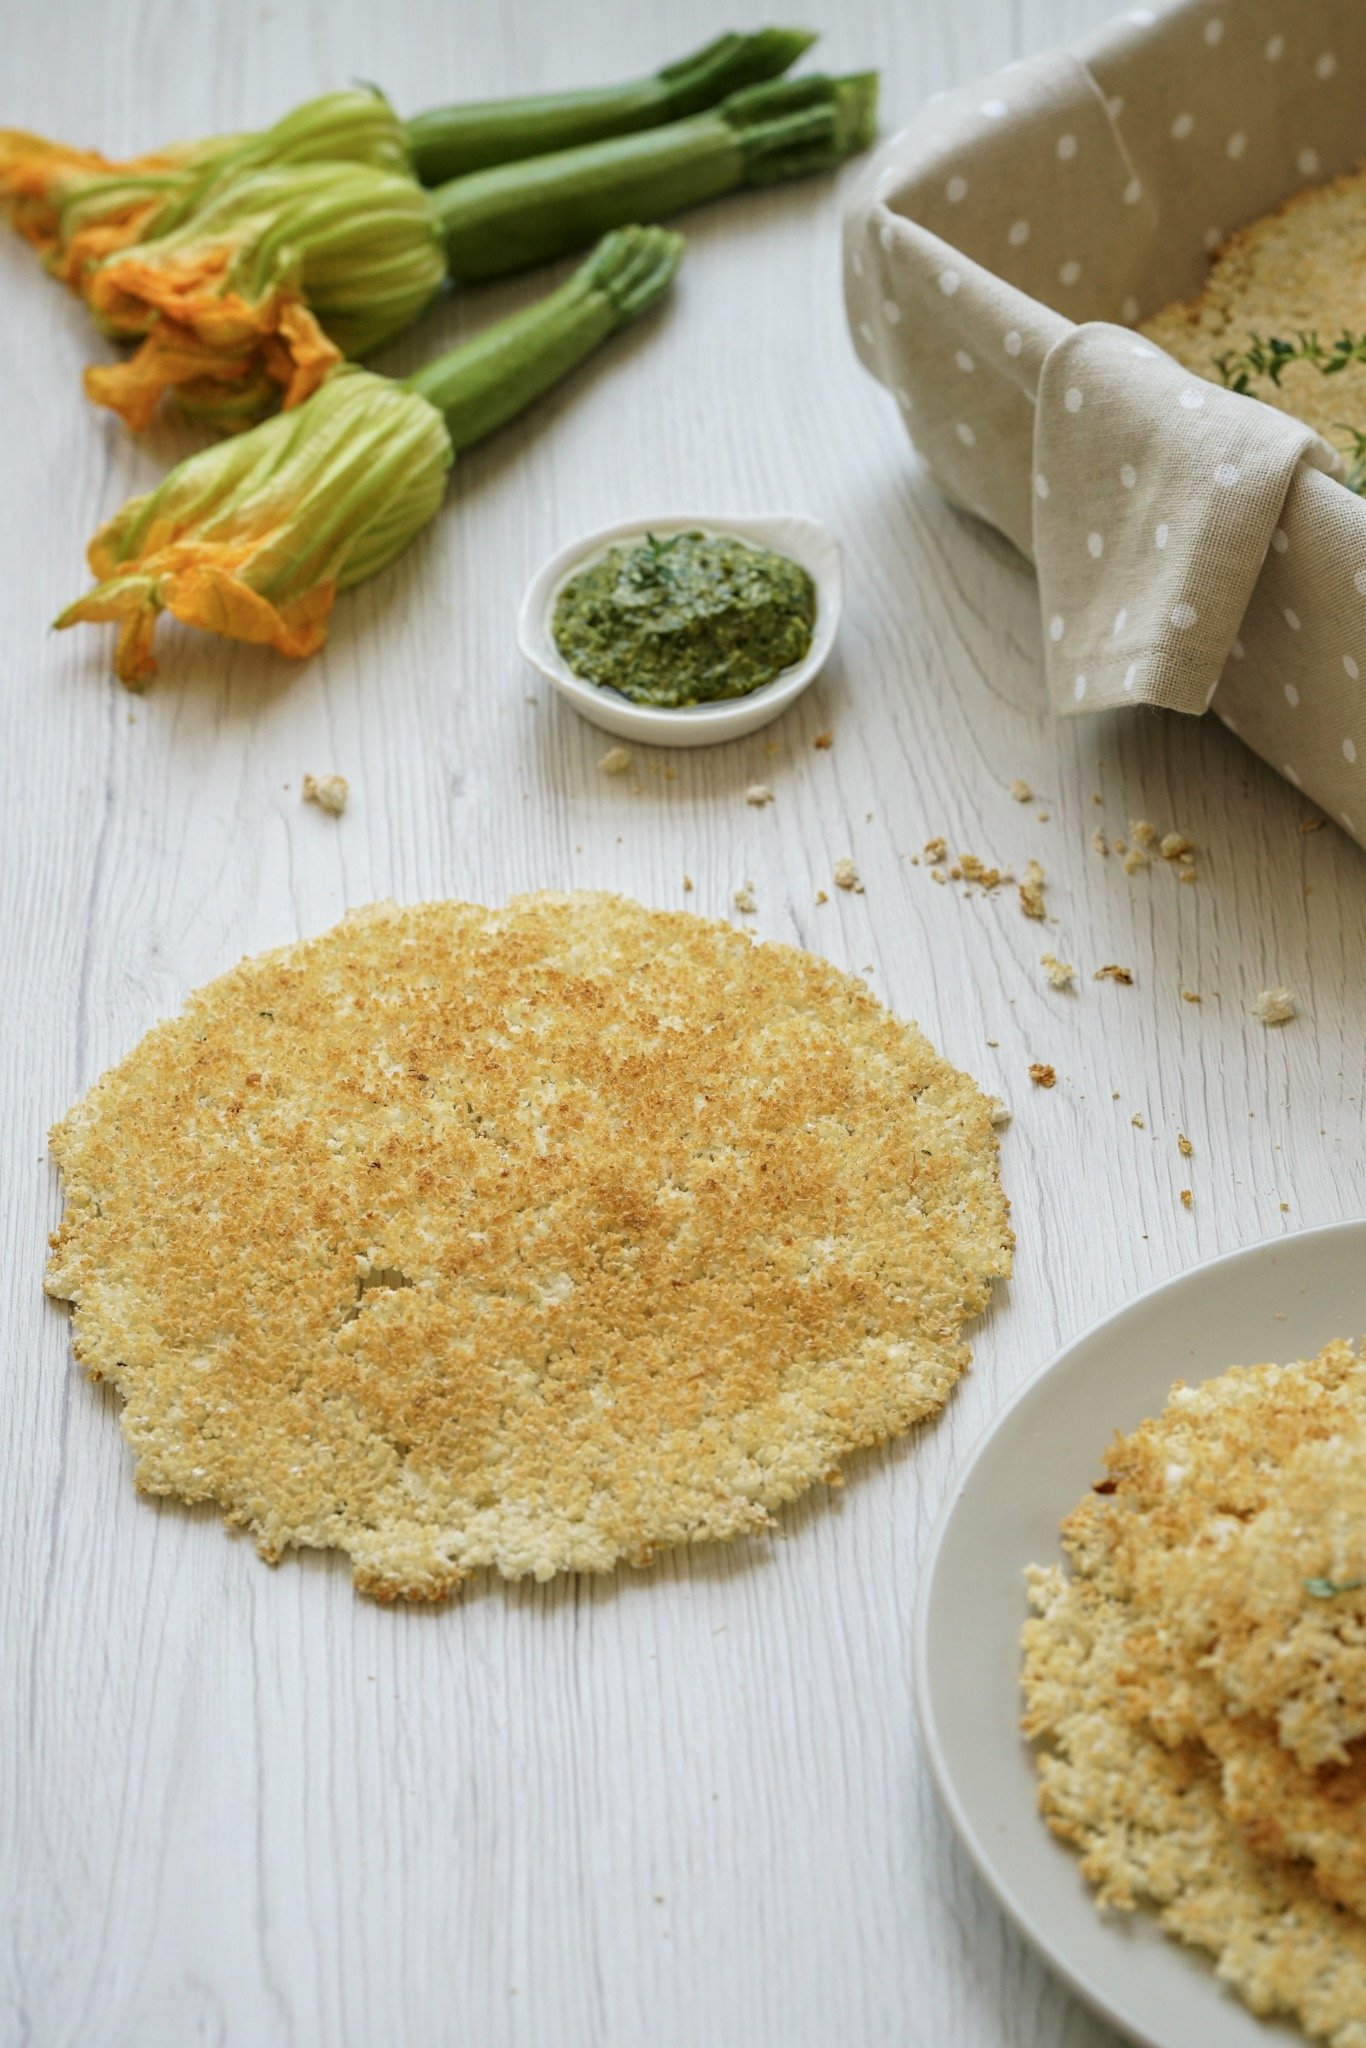 'Casabe' – Crispy Cassava Bread (Gluten Free, Paleo, AIP)